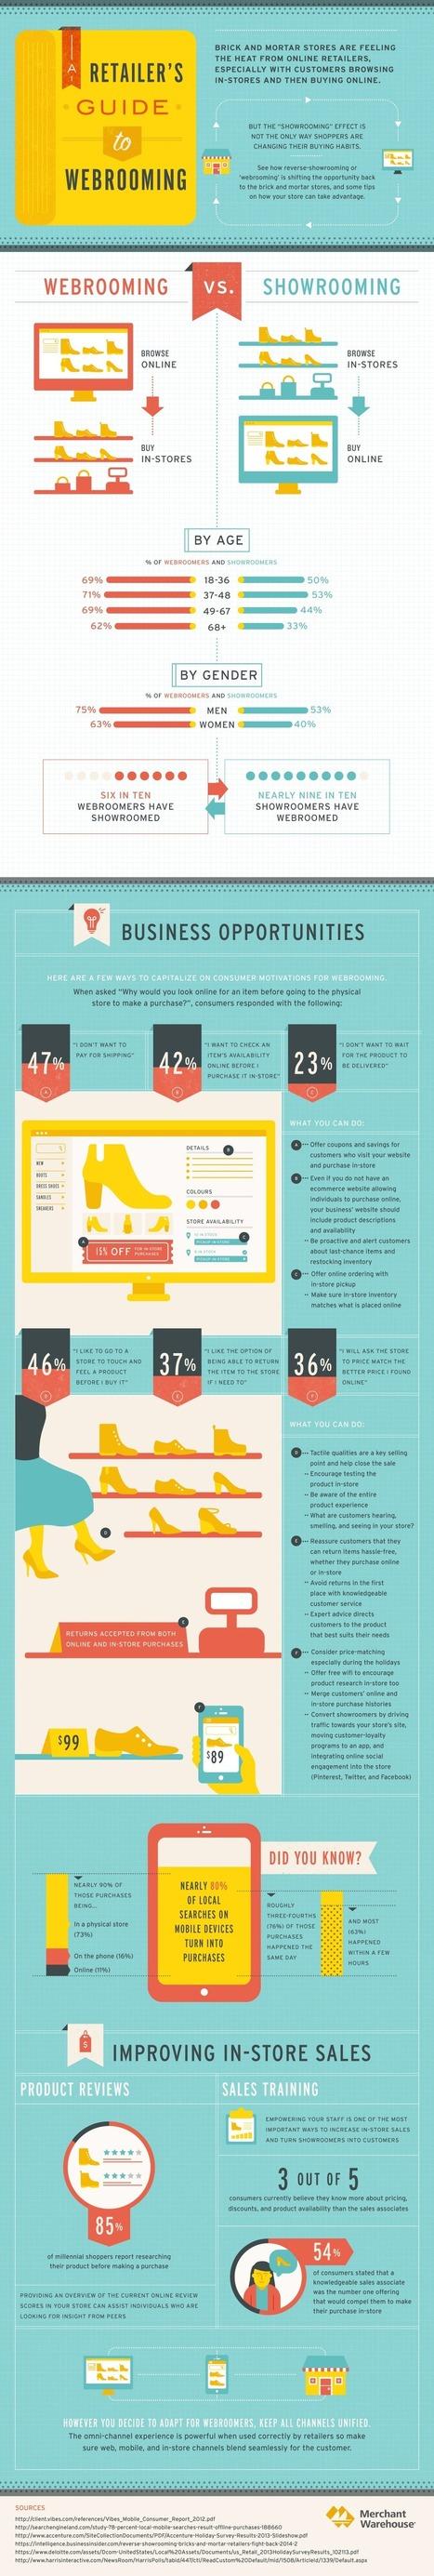 Webrooming vs. Showrooming | Cross-Border E-commerce Europe | Scoop.it